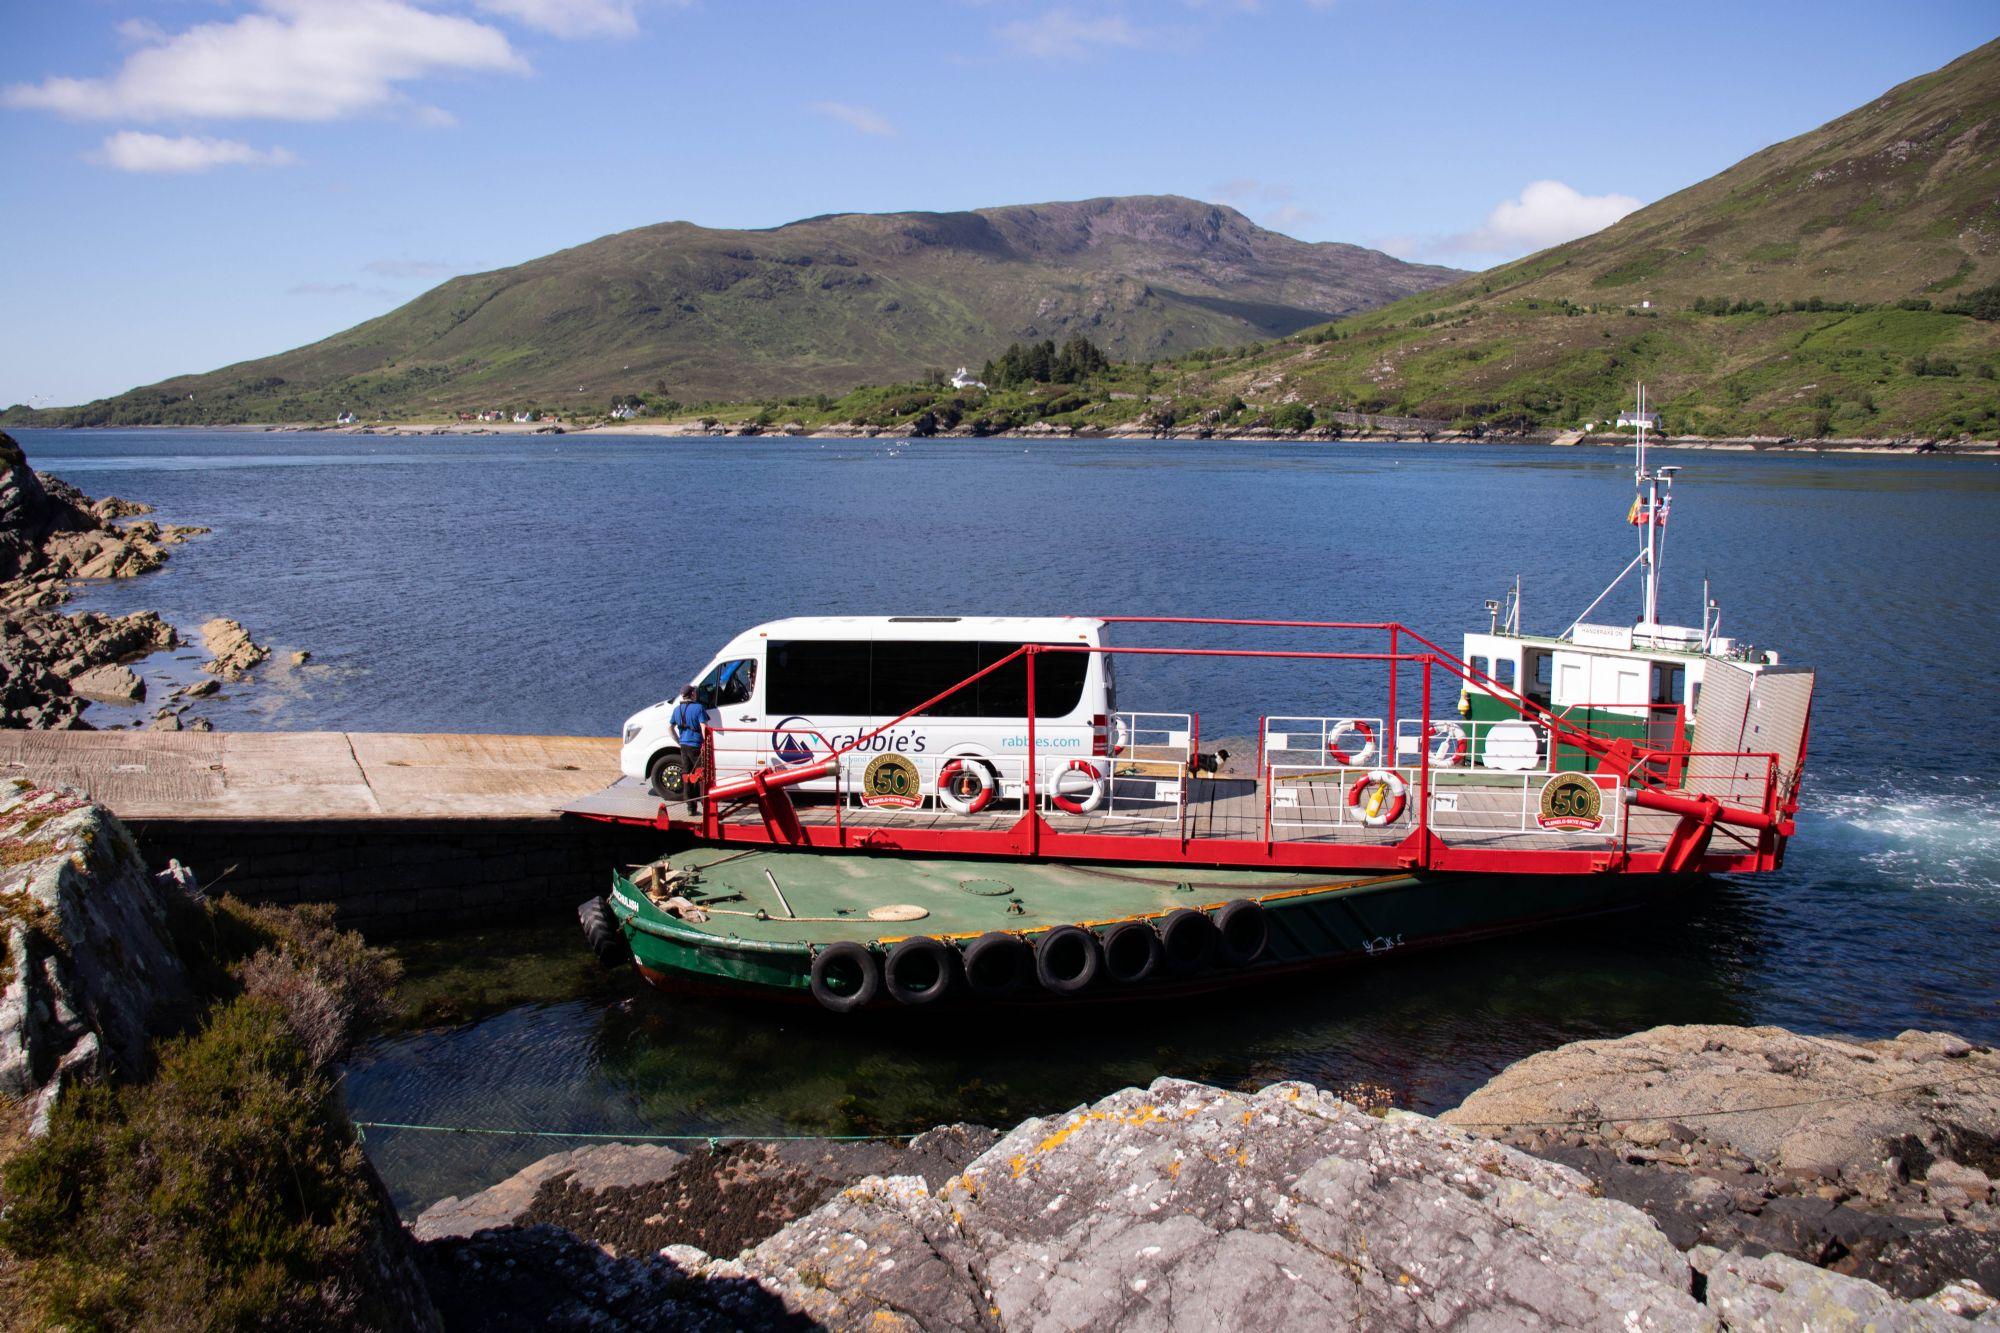 The Glenelg ferry